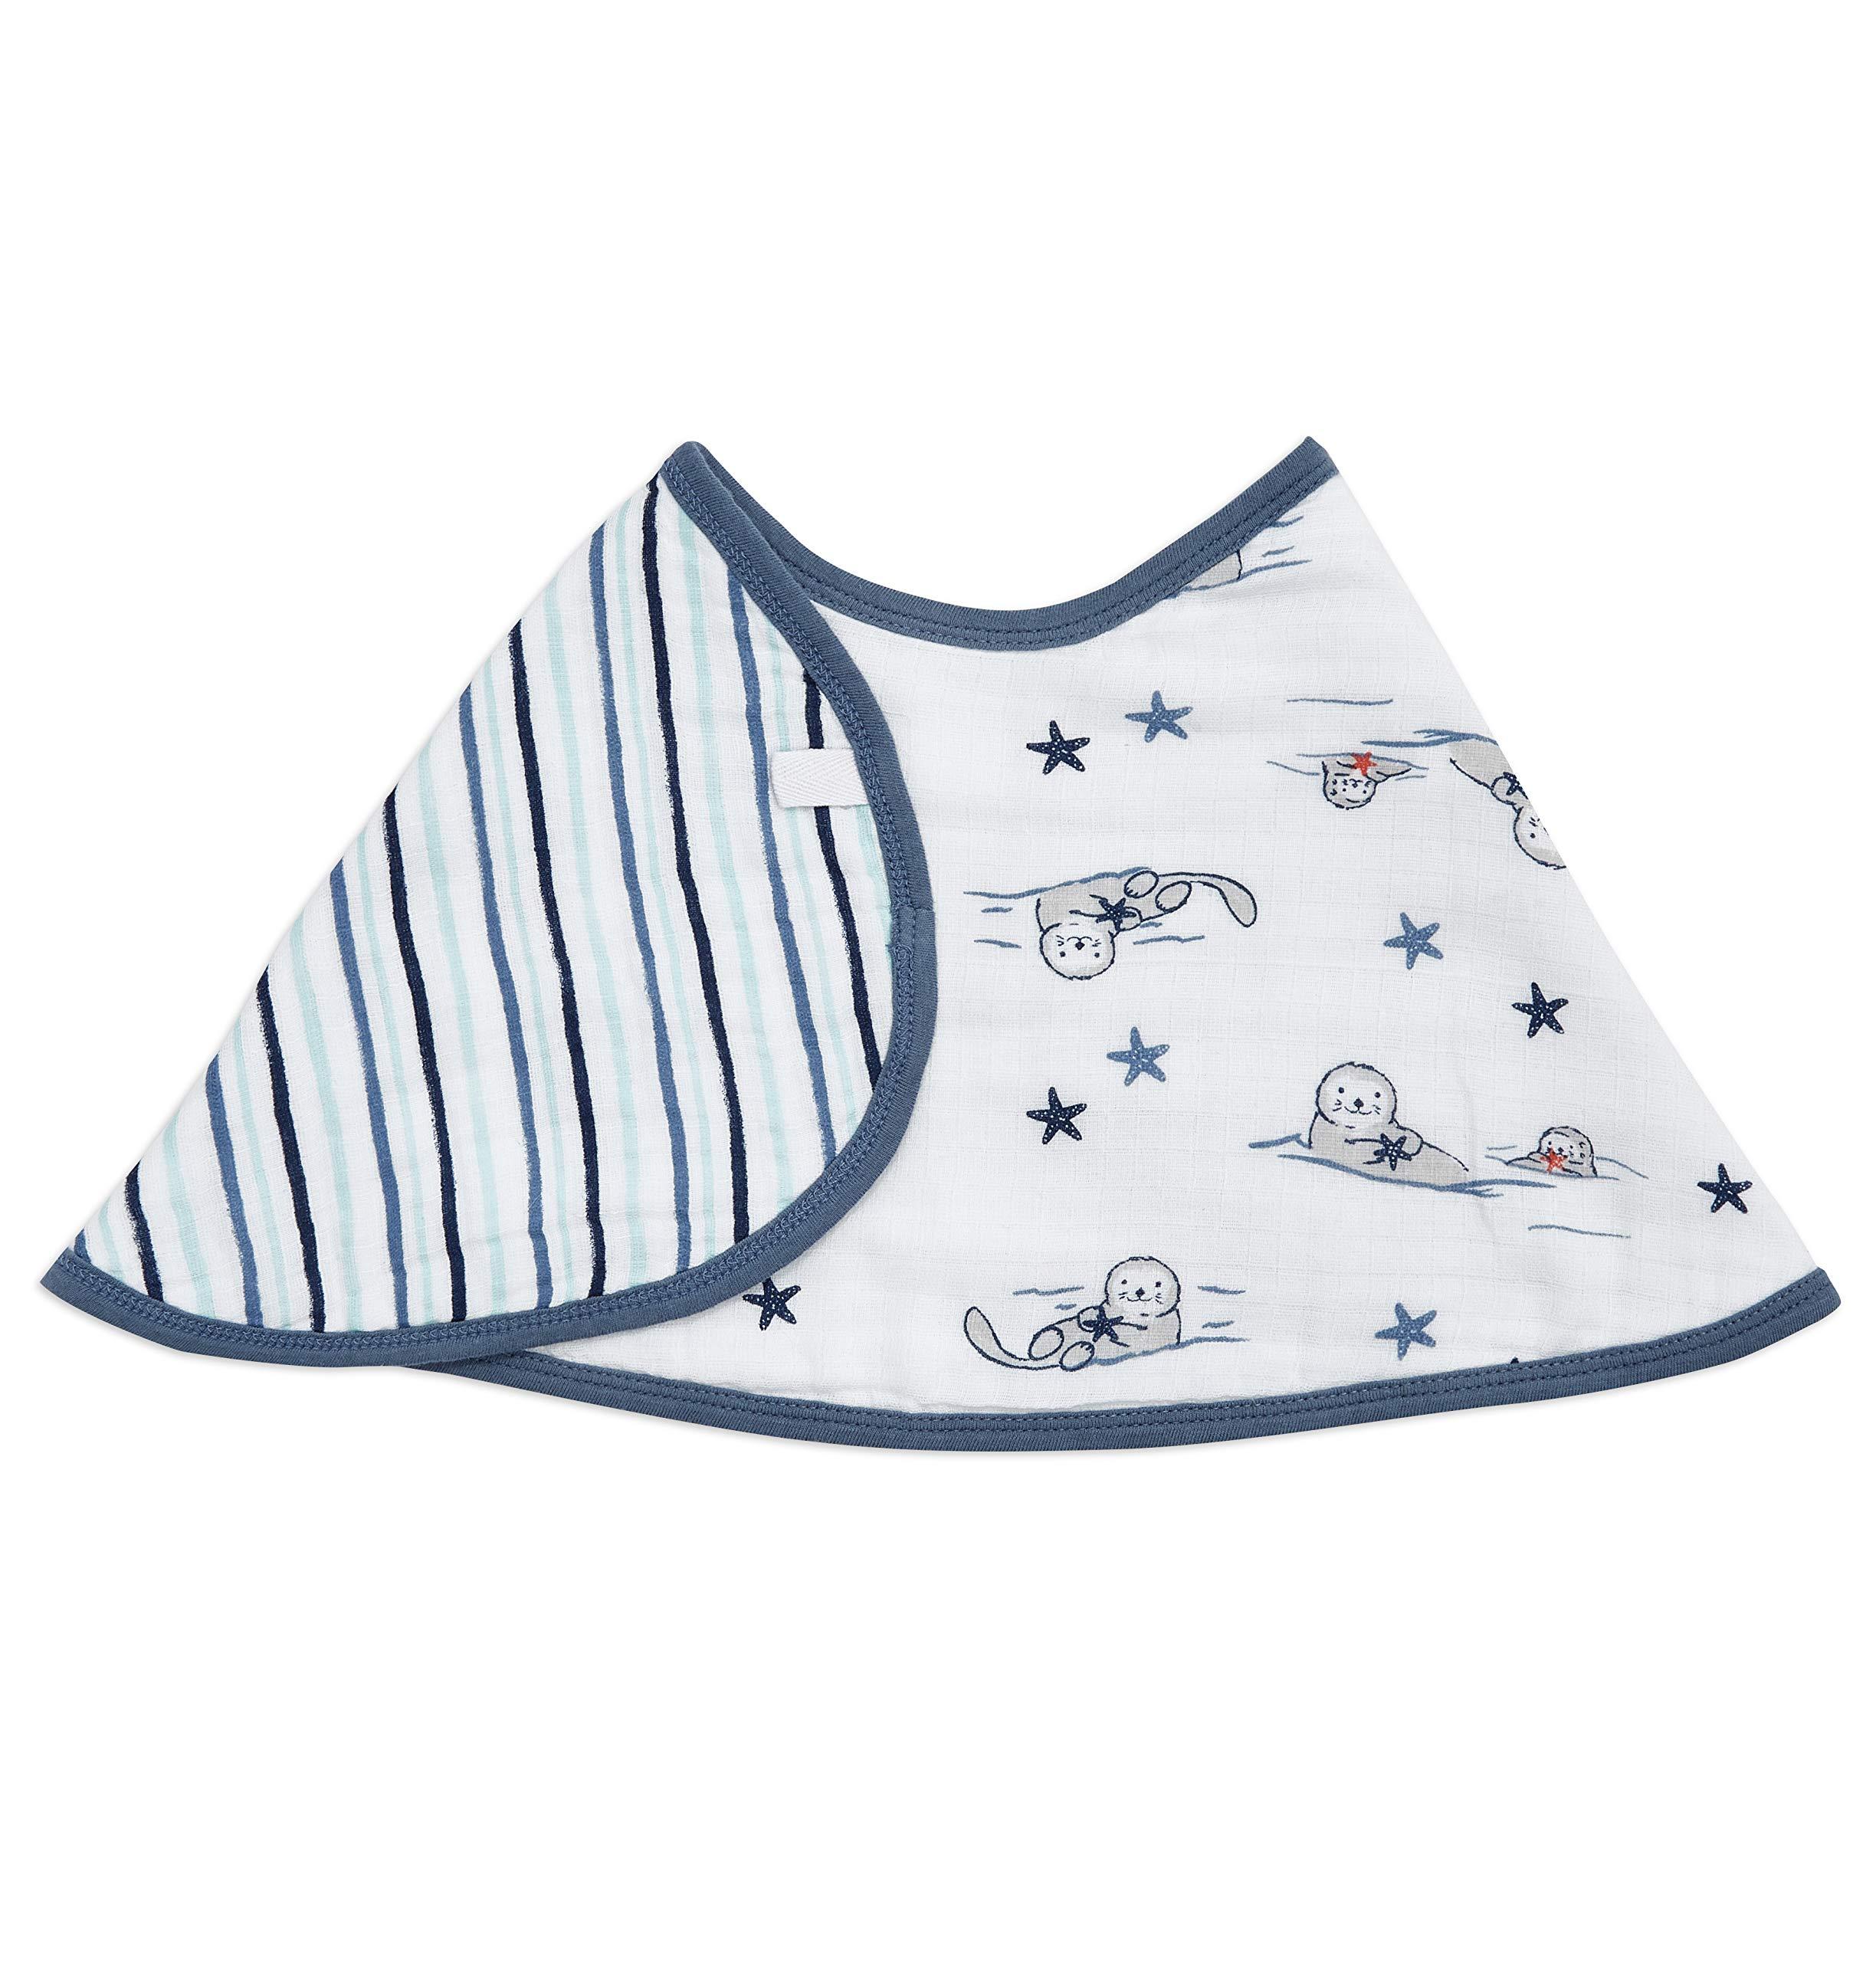 "aden + anais Burpy Baby Bib, 100% Cotton Muslin, Soft Absorbent 4 Layers, Multi-Use Burp Cloth and Bib, 22.5"" X 11"", Single, Seashore Otters"